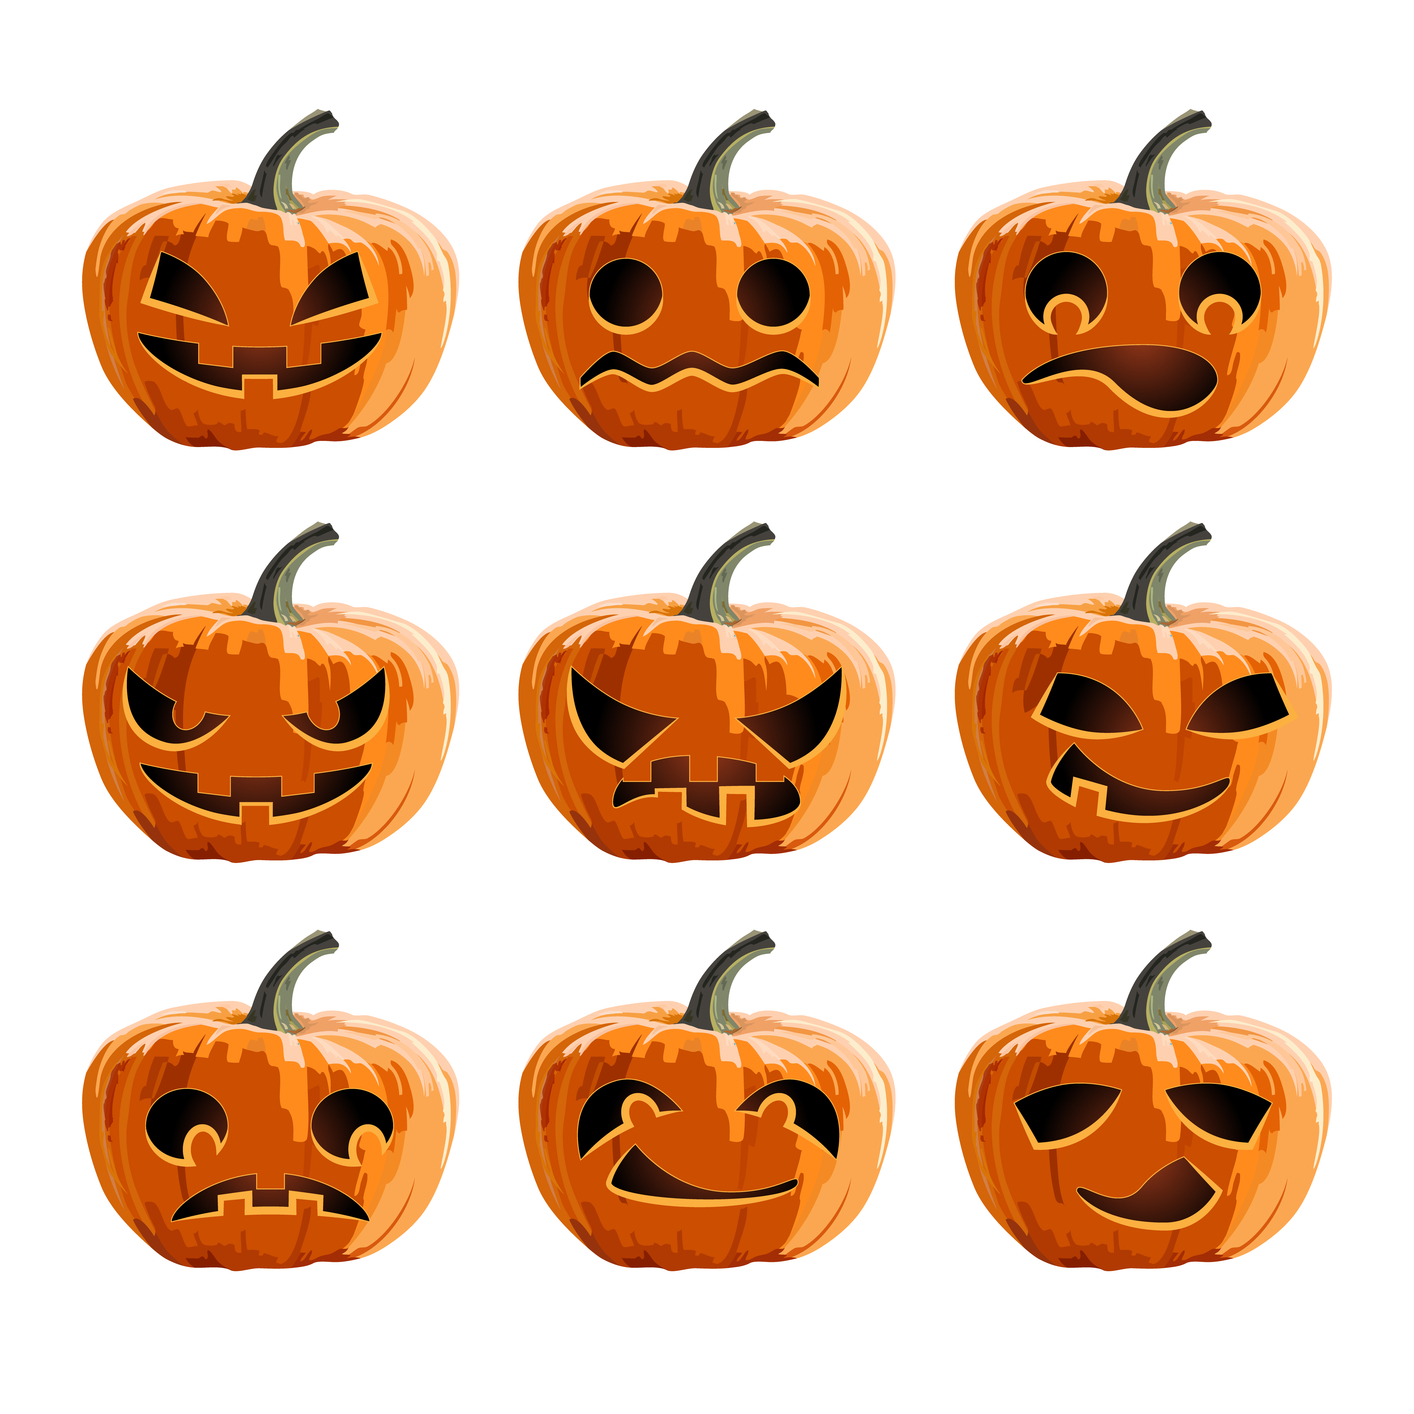 free vector halloween clipart - photo #24